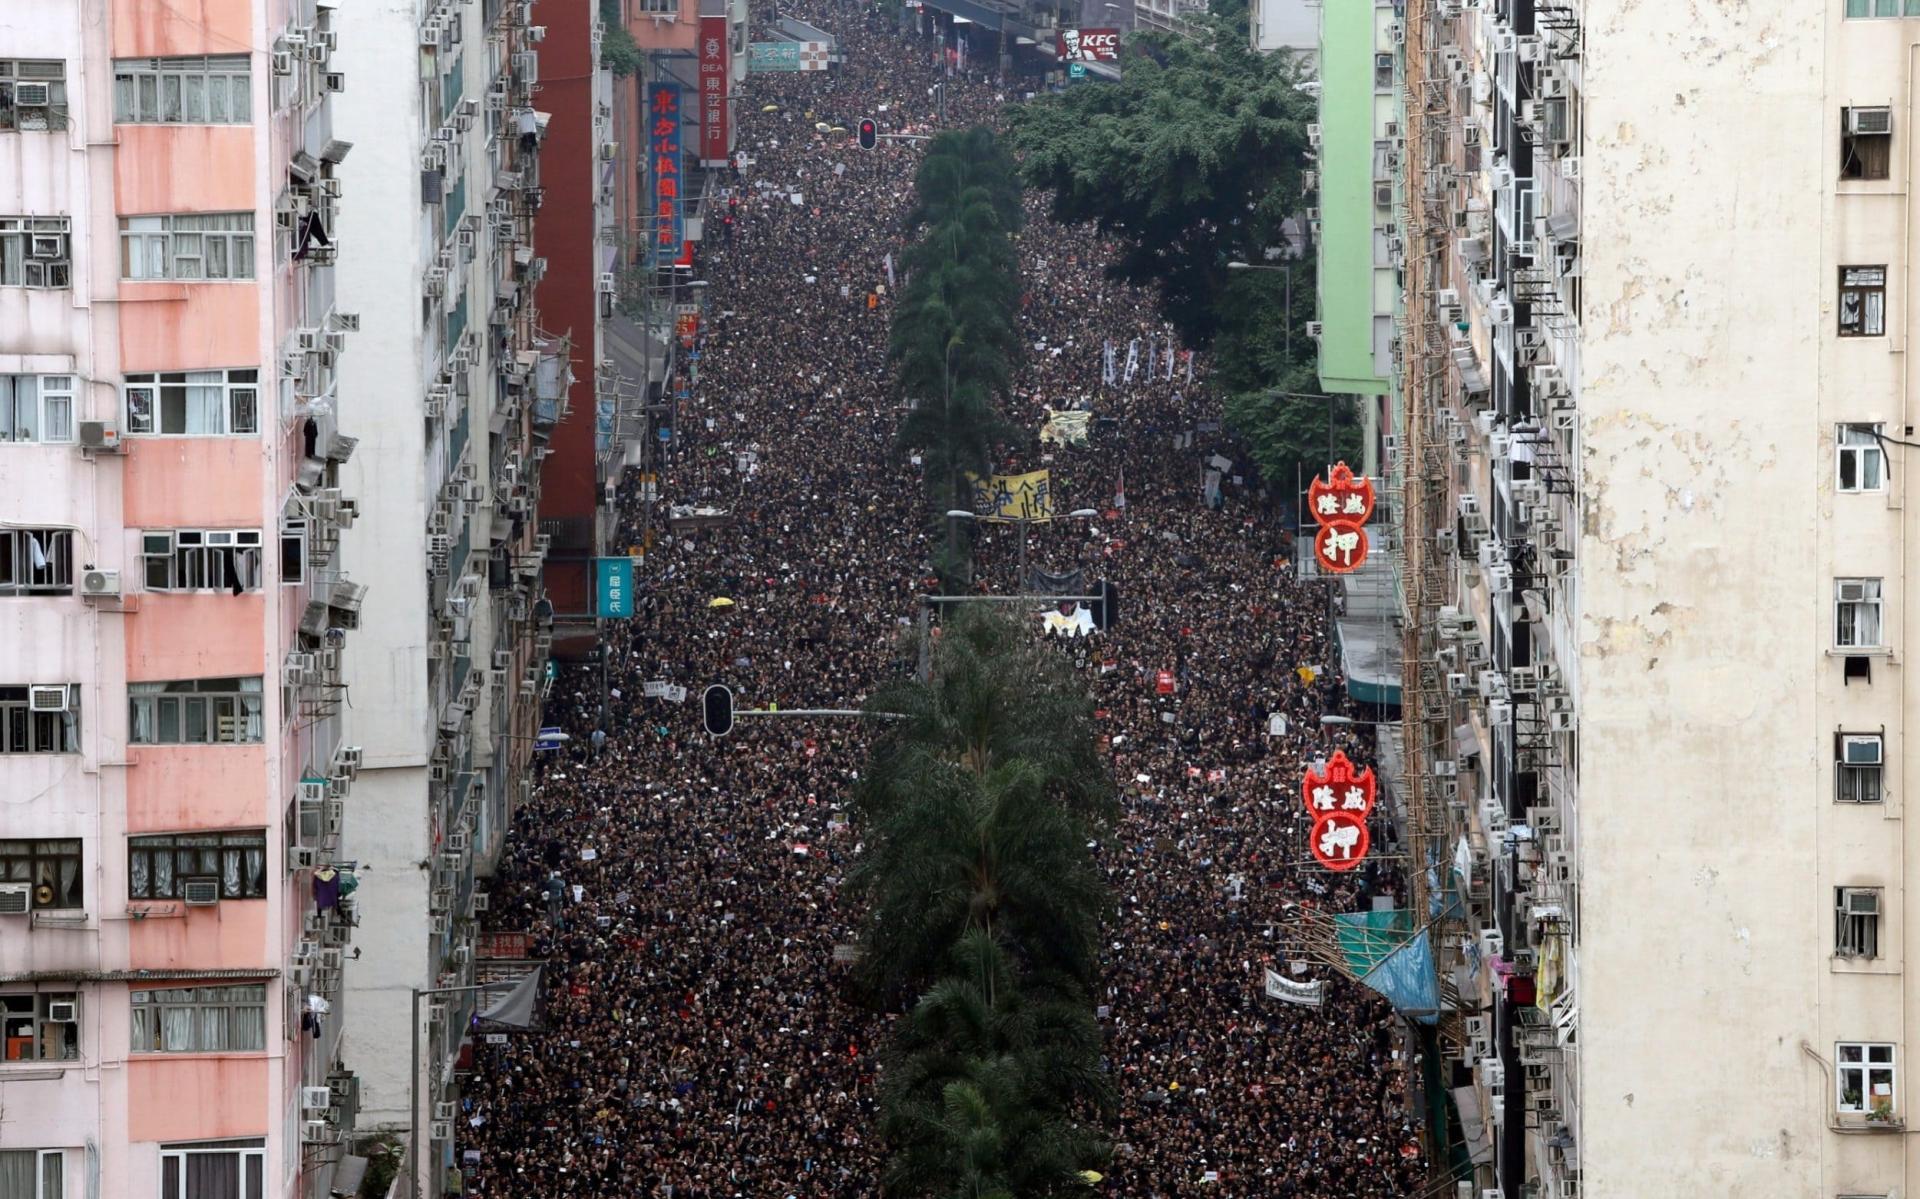 Manifestation monstre à Hongkong, le 16 juin. REUTERS